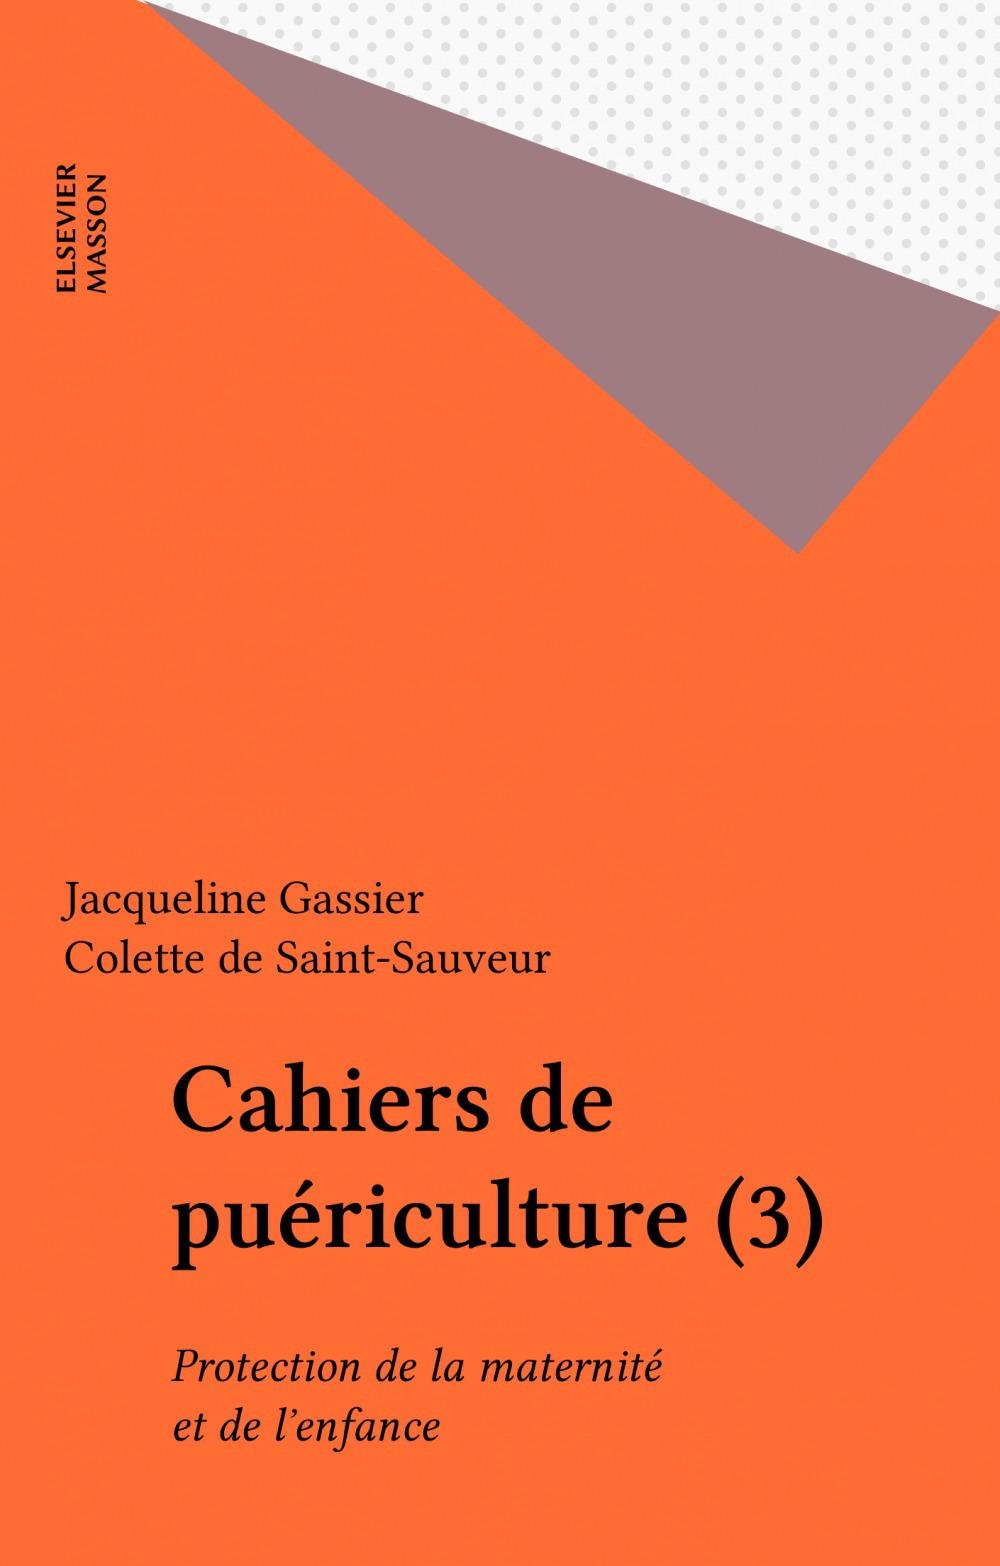 Cahiers de puériculture (3)